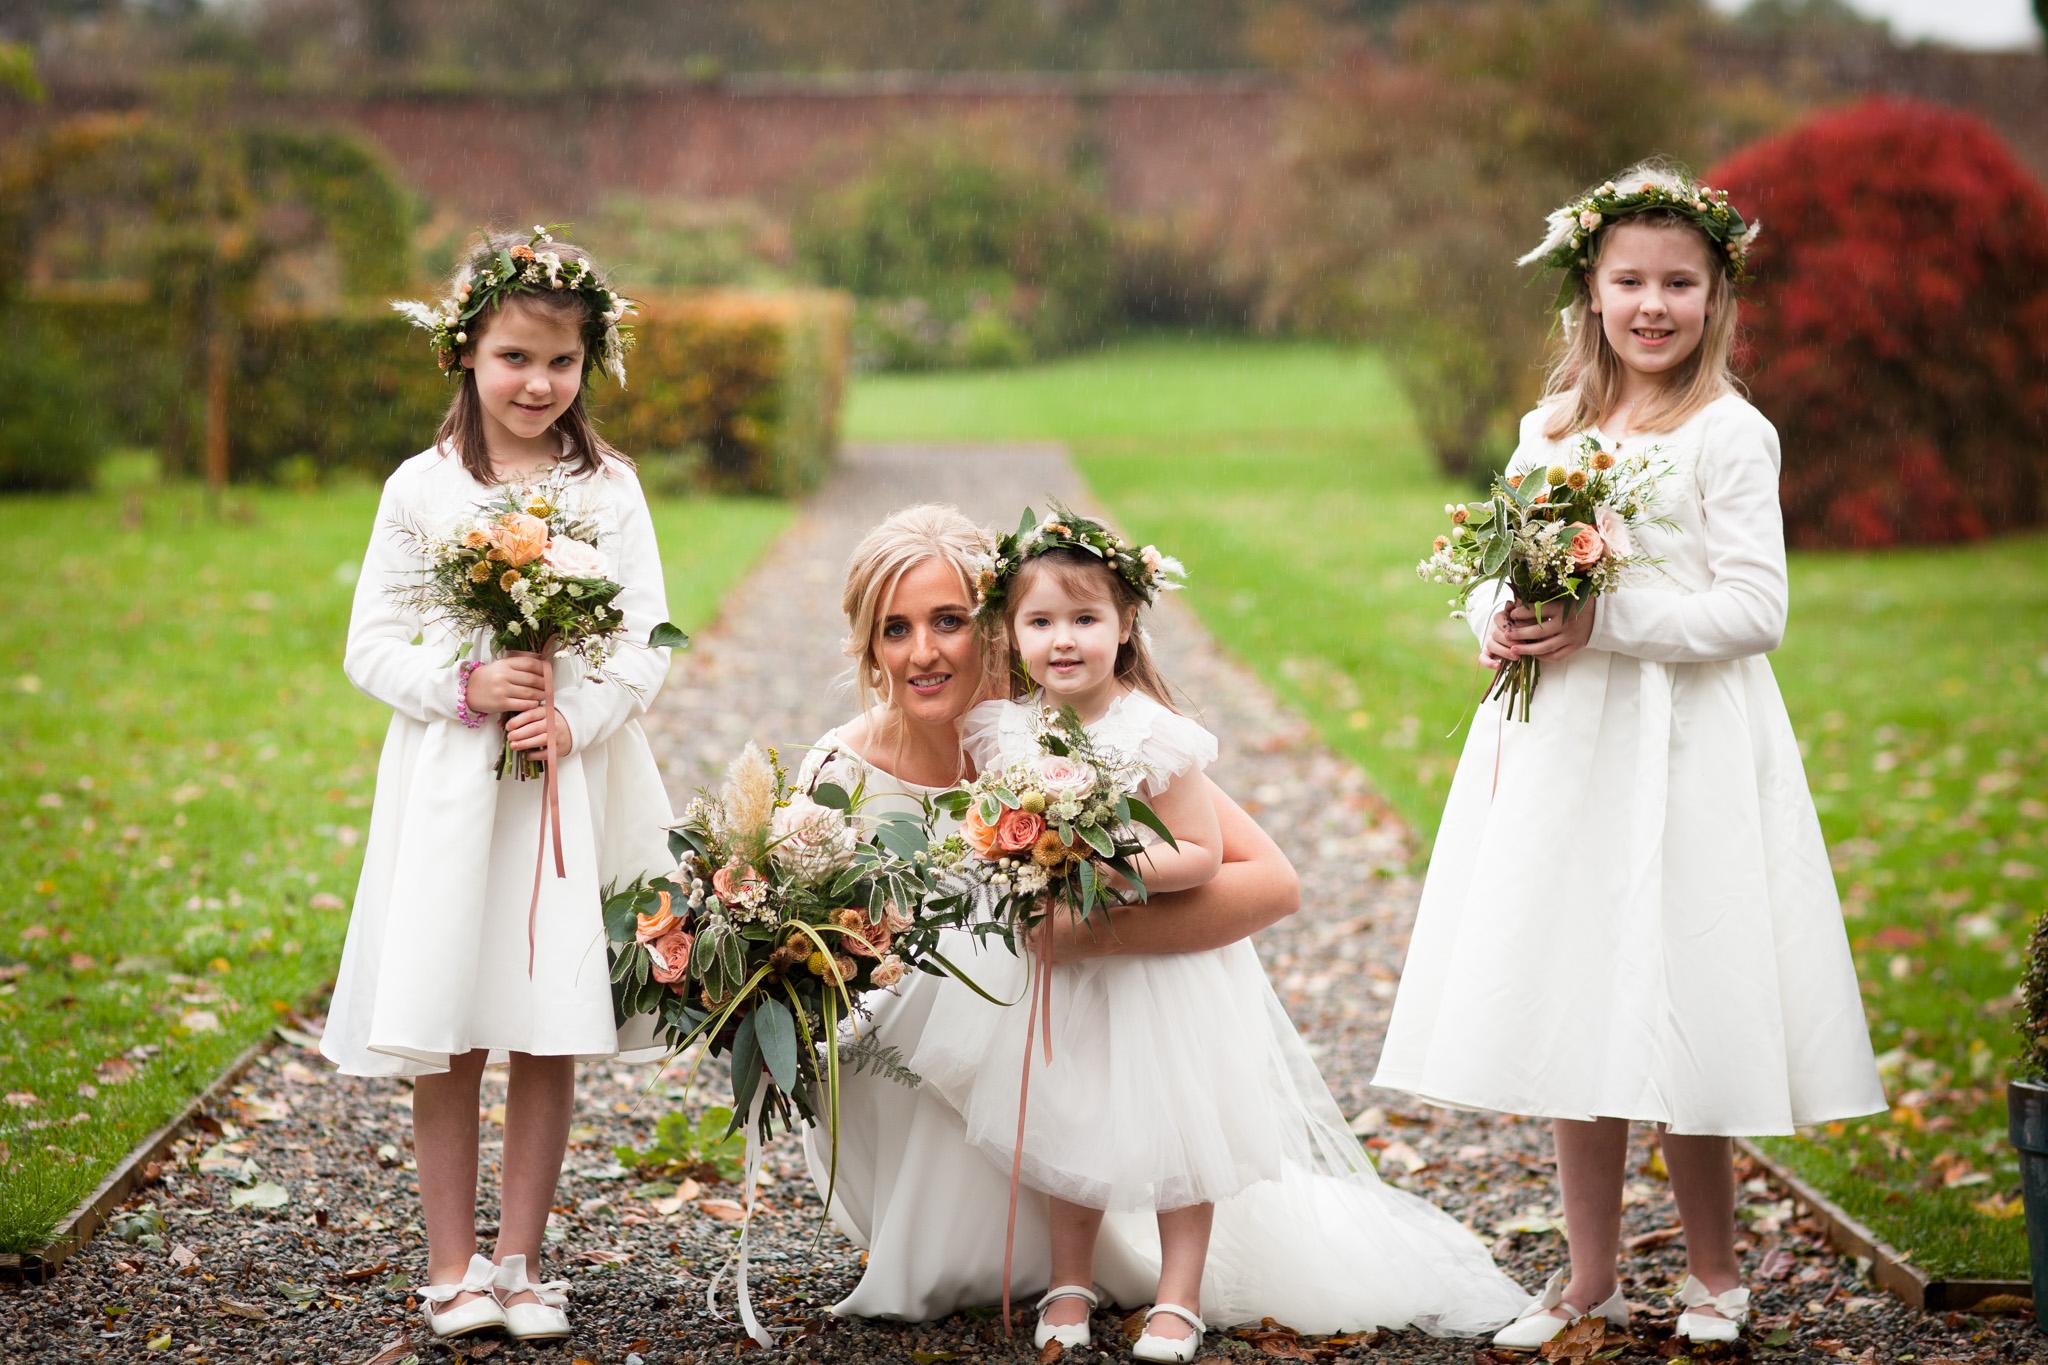 Mark_Barnes_Northern_Ireland_Wedding_Photography_Ballyscullion_Park_Wedding_Photography_Stef&Bobby-43.jpg